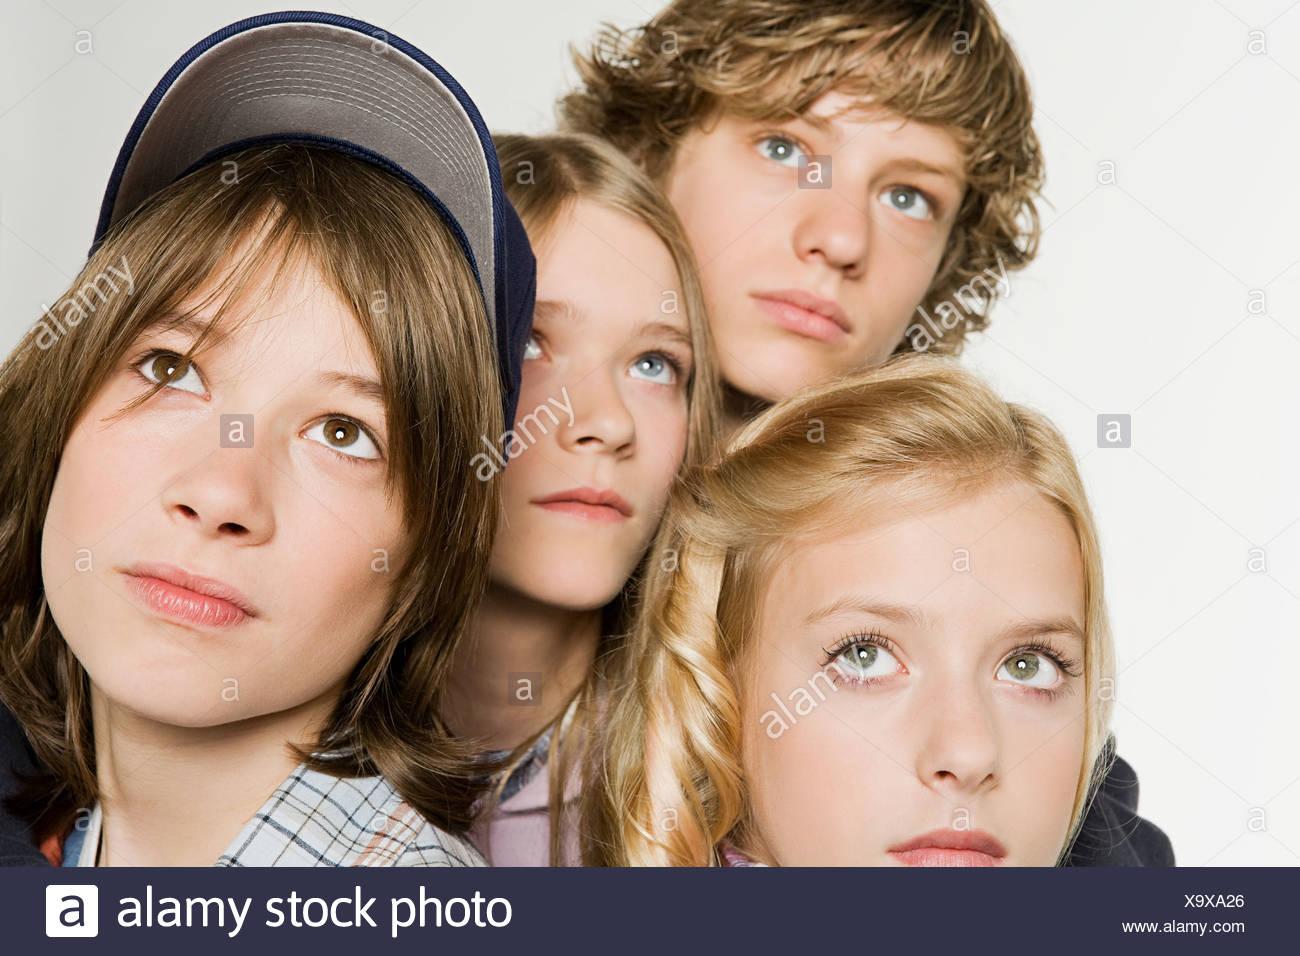 Teenager pic